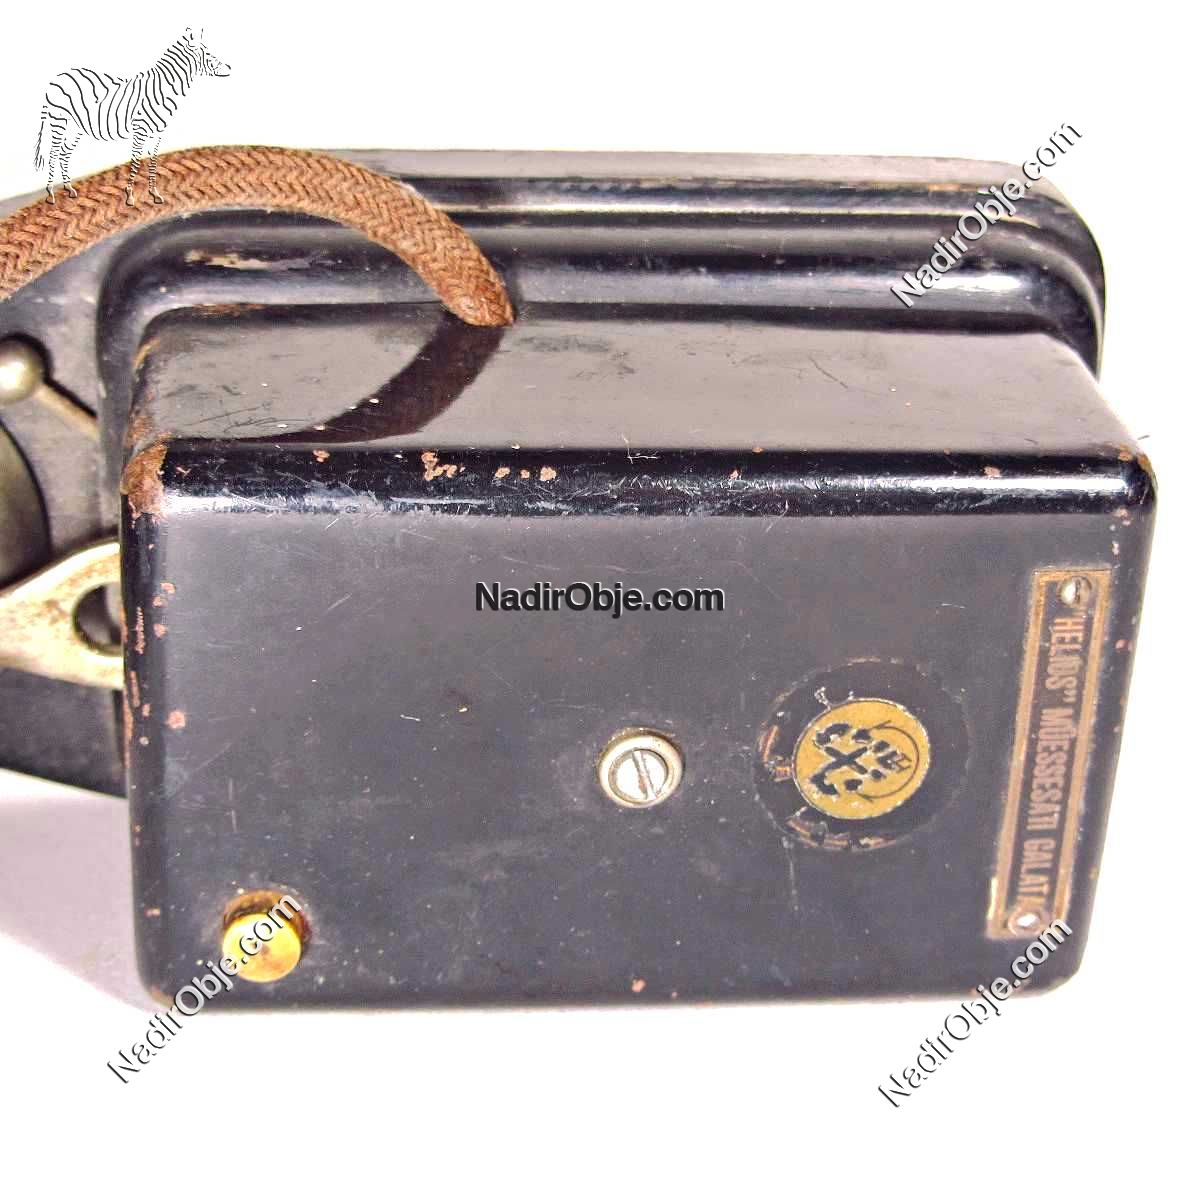 n1287-cok-eski-telefon-makinasi-nadir-obje-6